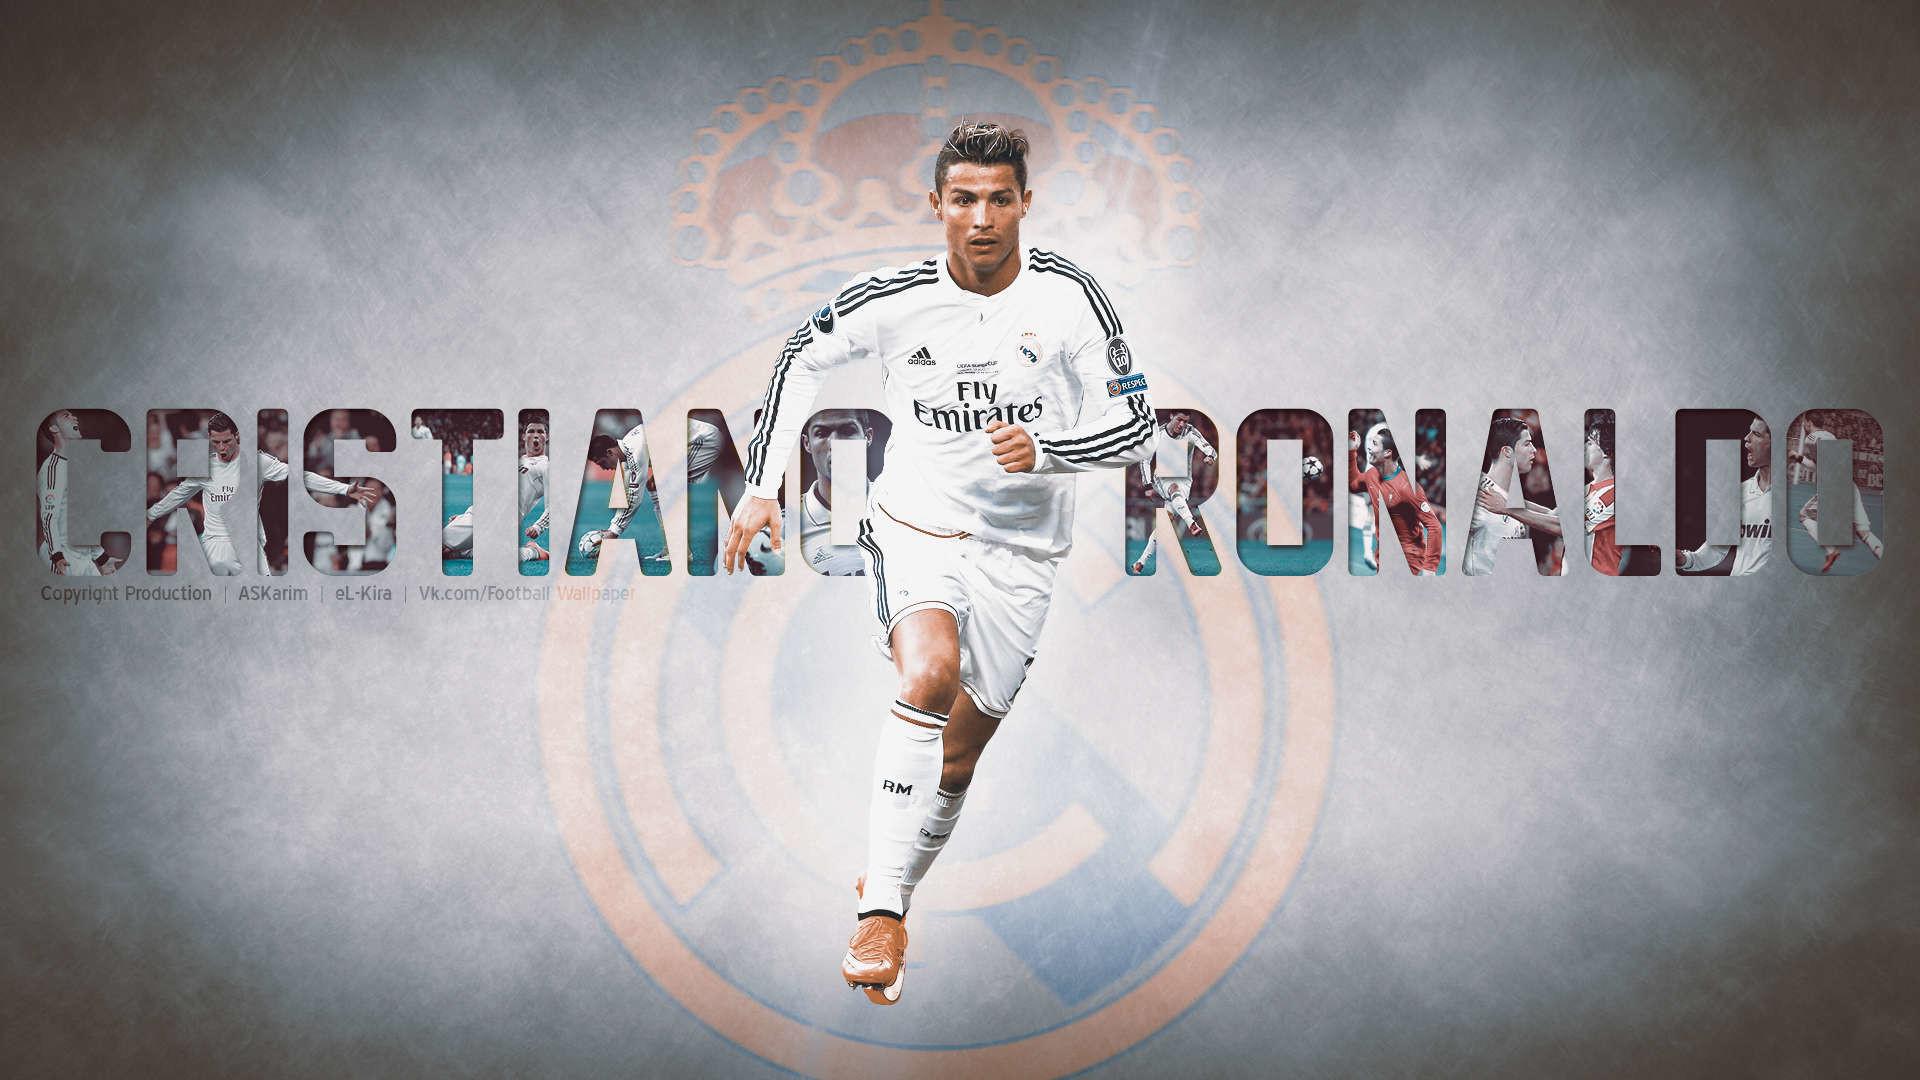 Cristiano Ronaldo Photos And Wallpapers 2018